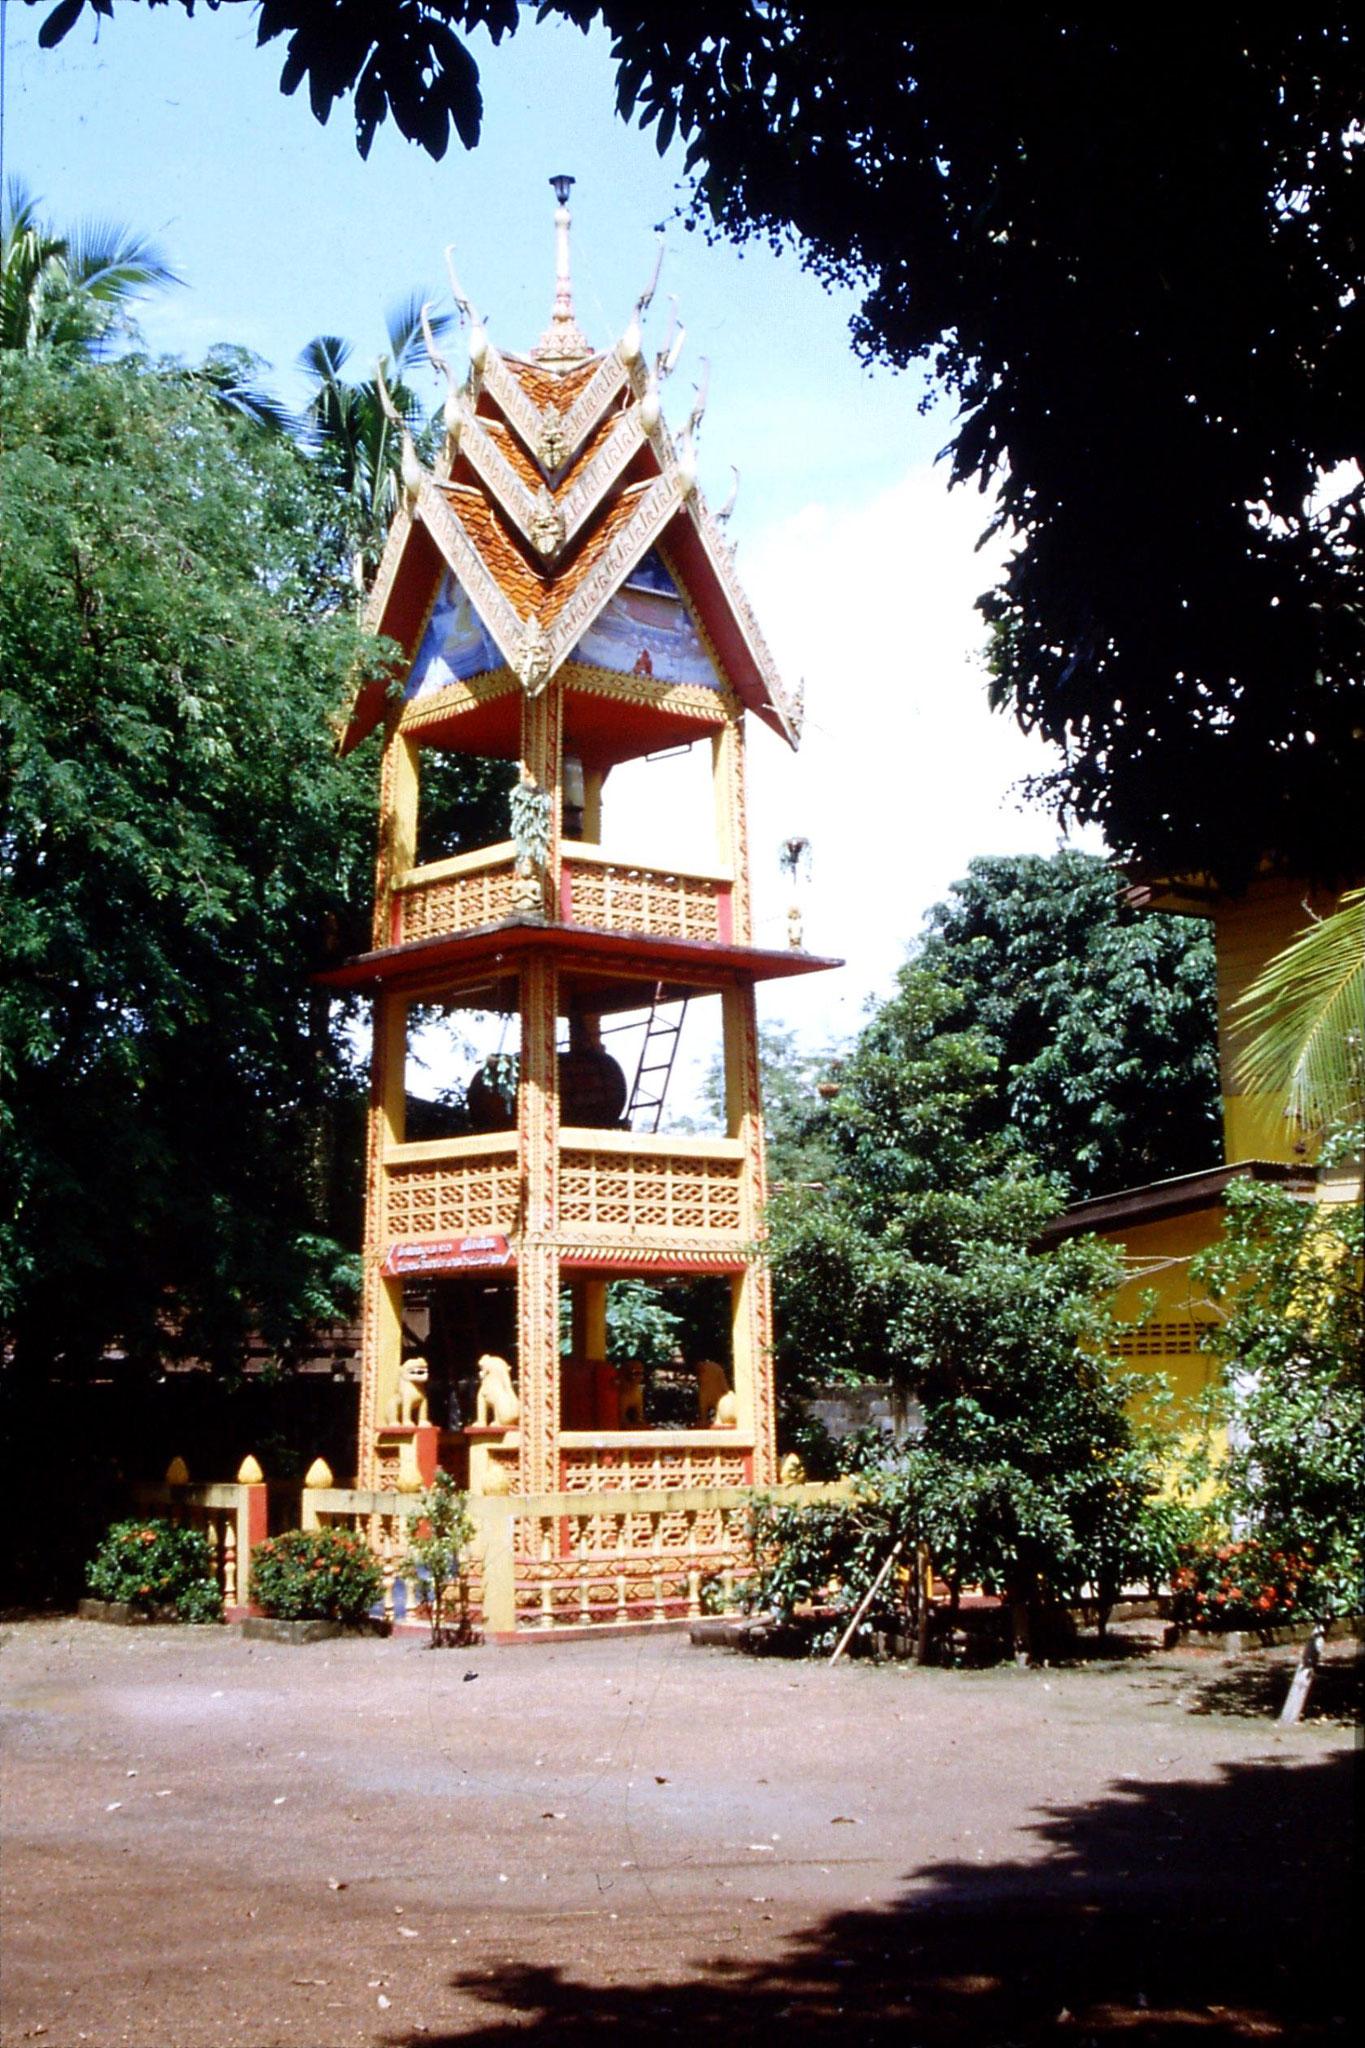 30/5/1990: 23: village east of Nong Khai